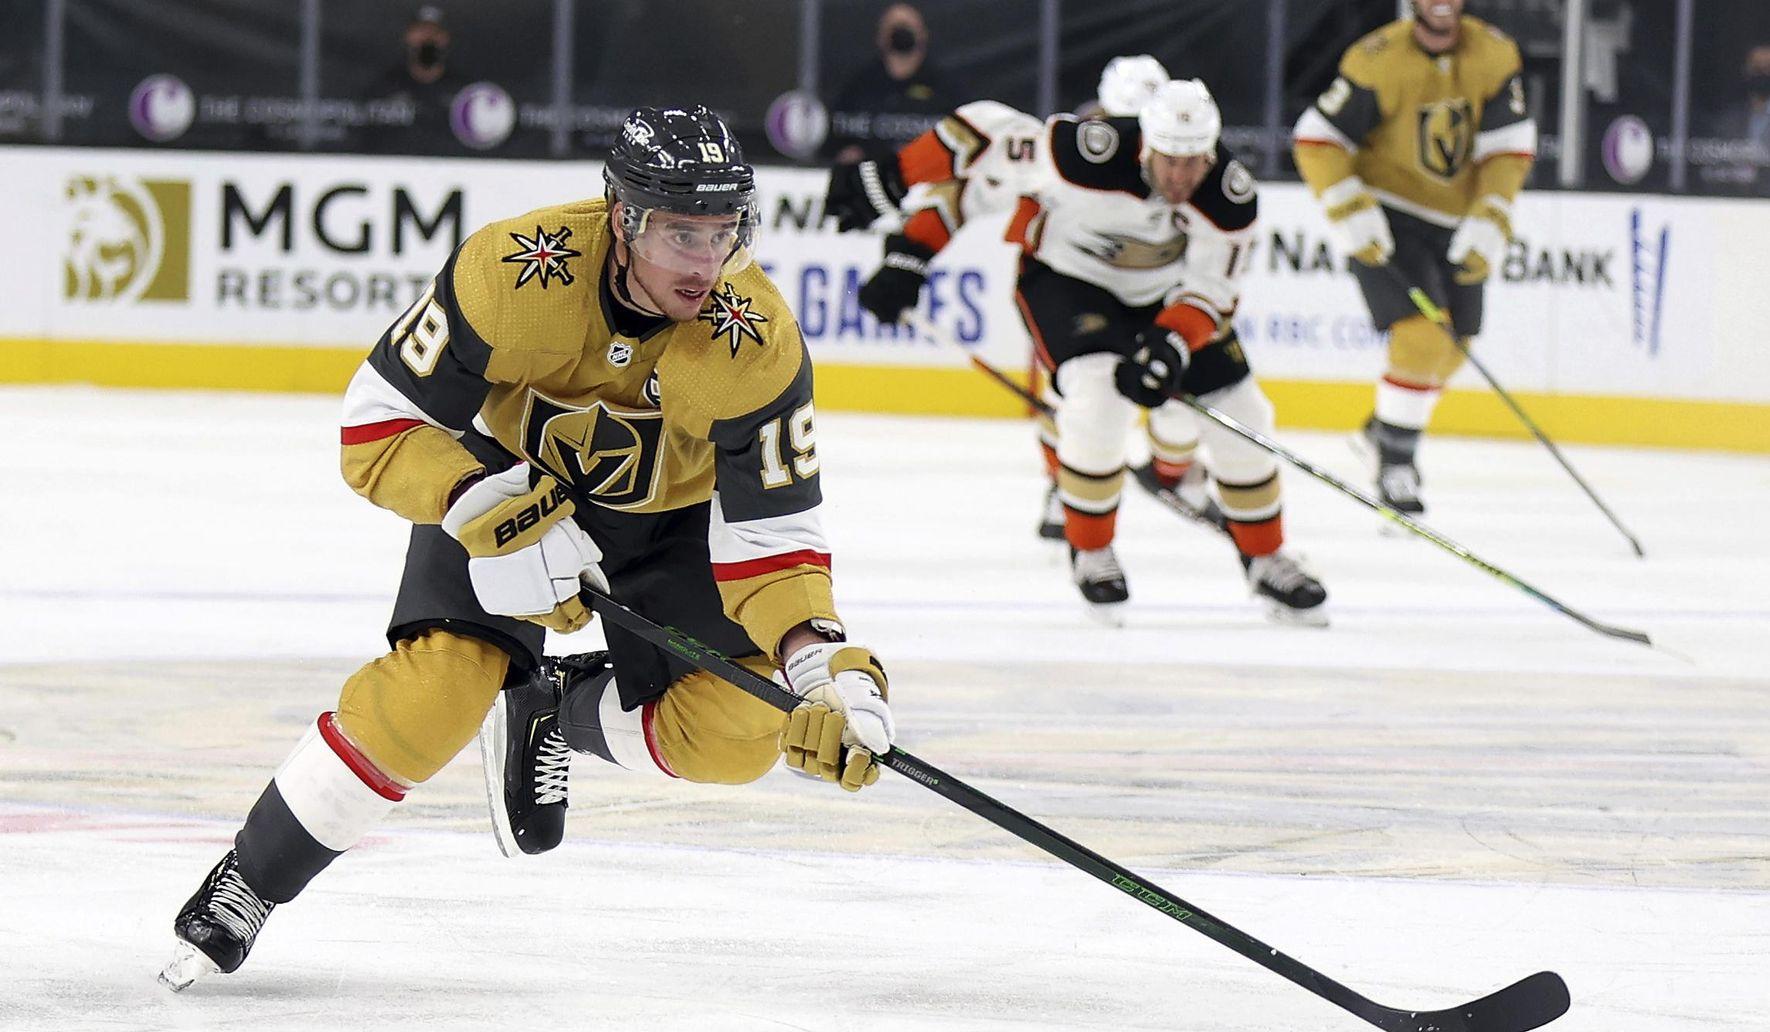 Ducks_golden_knights_hockey_73139_c0-128-2292-1464_s1770x1032